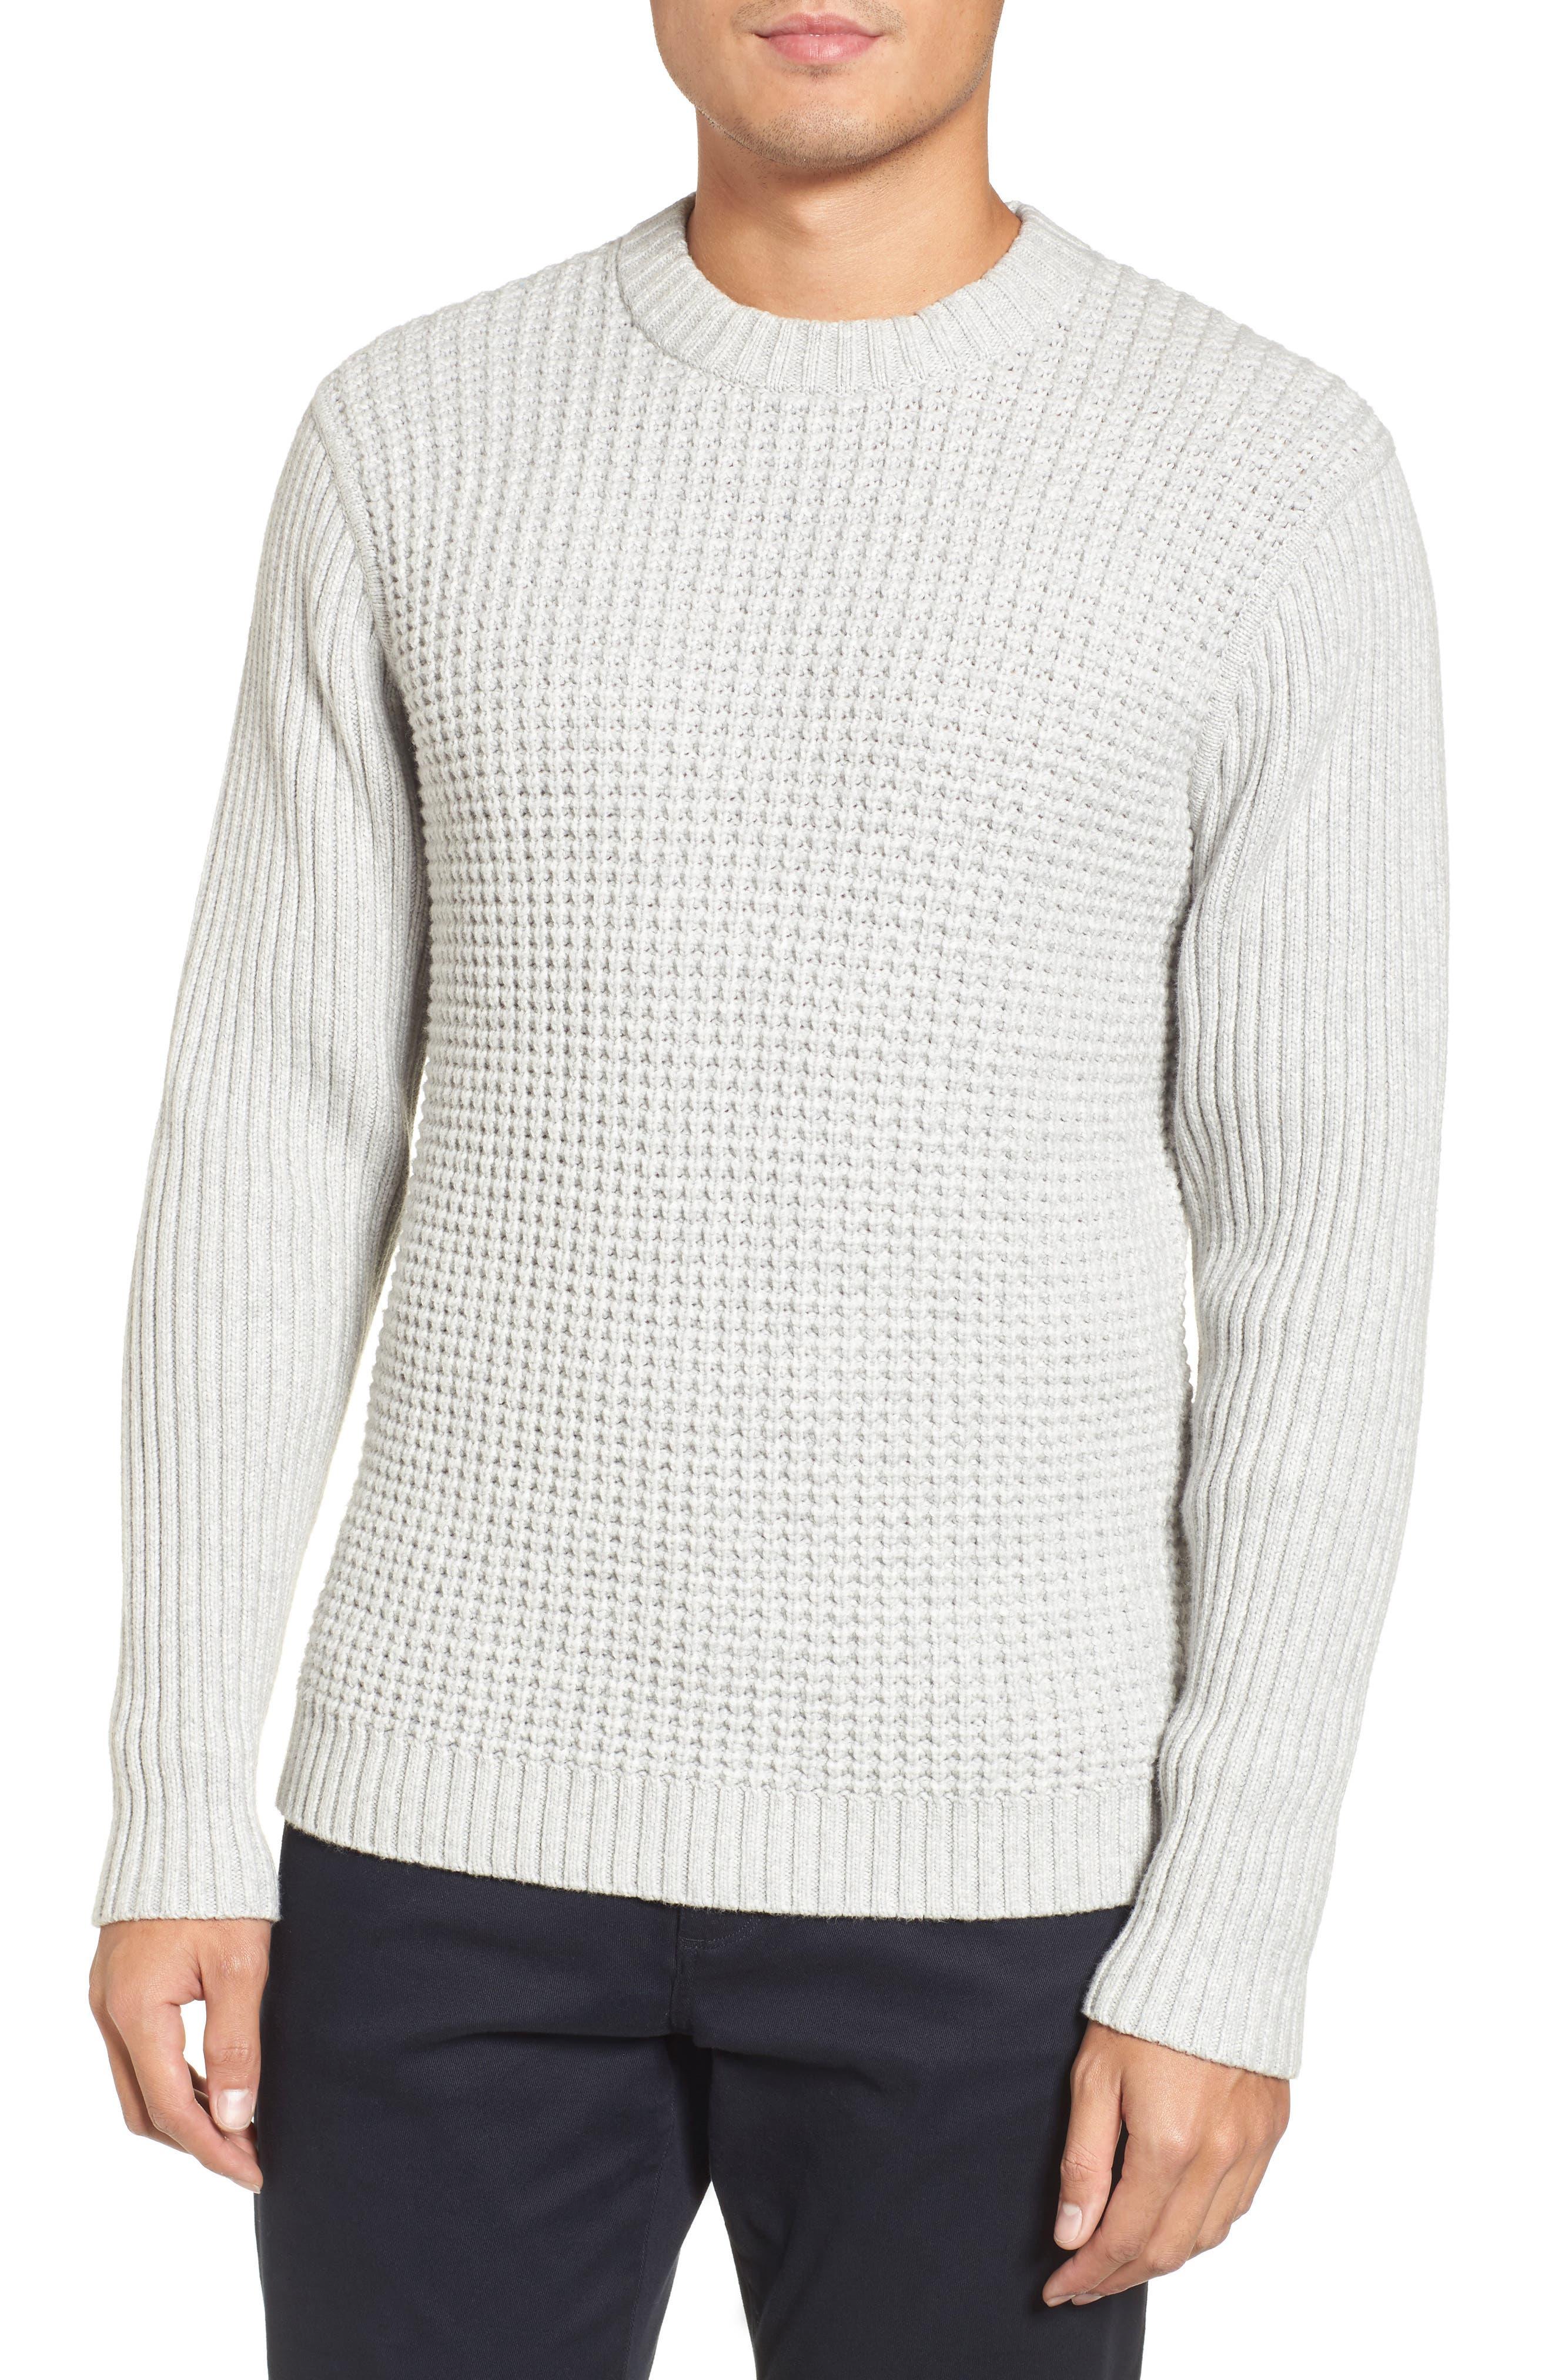 Heavyweight Mixed Knit Crewneck Sweater,                         Main,                         color, Grey Sleet Heather